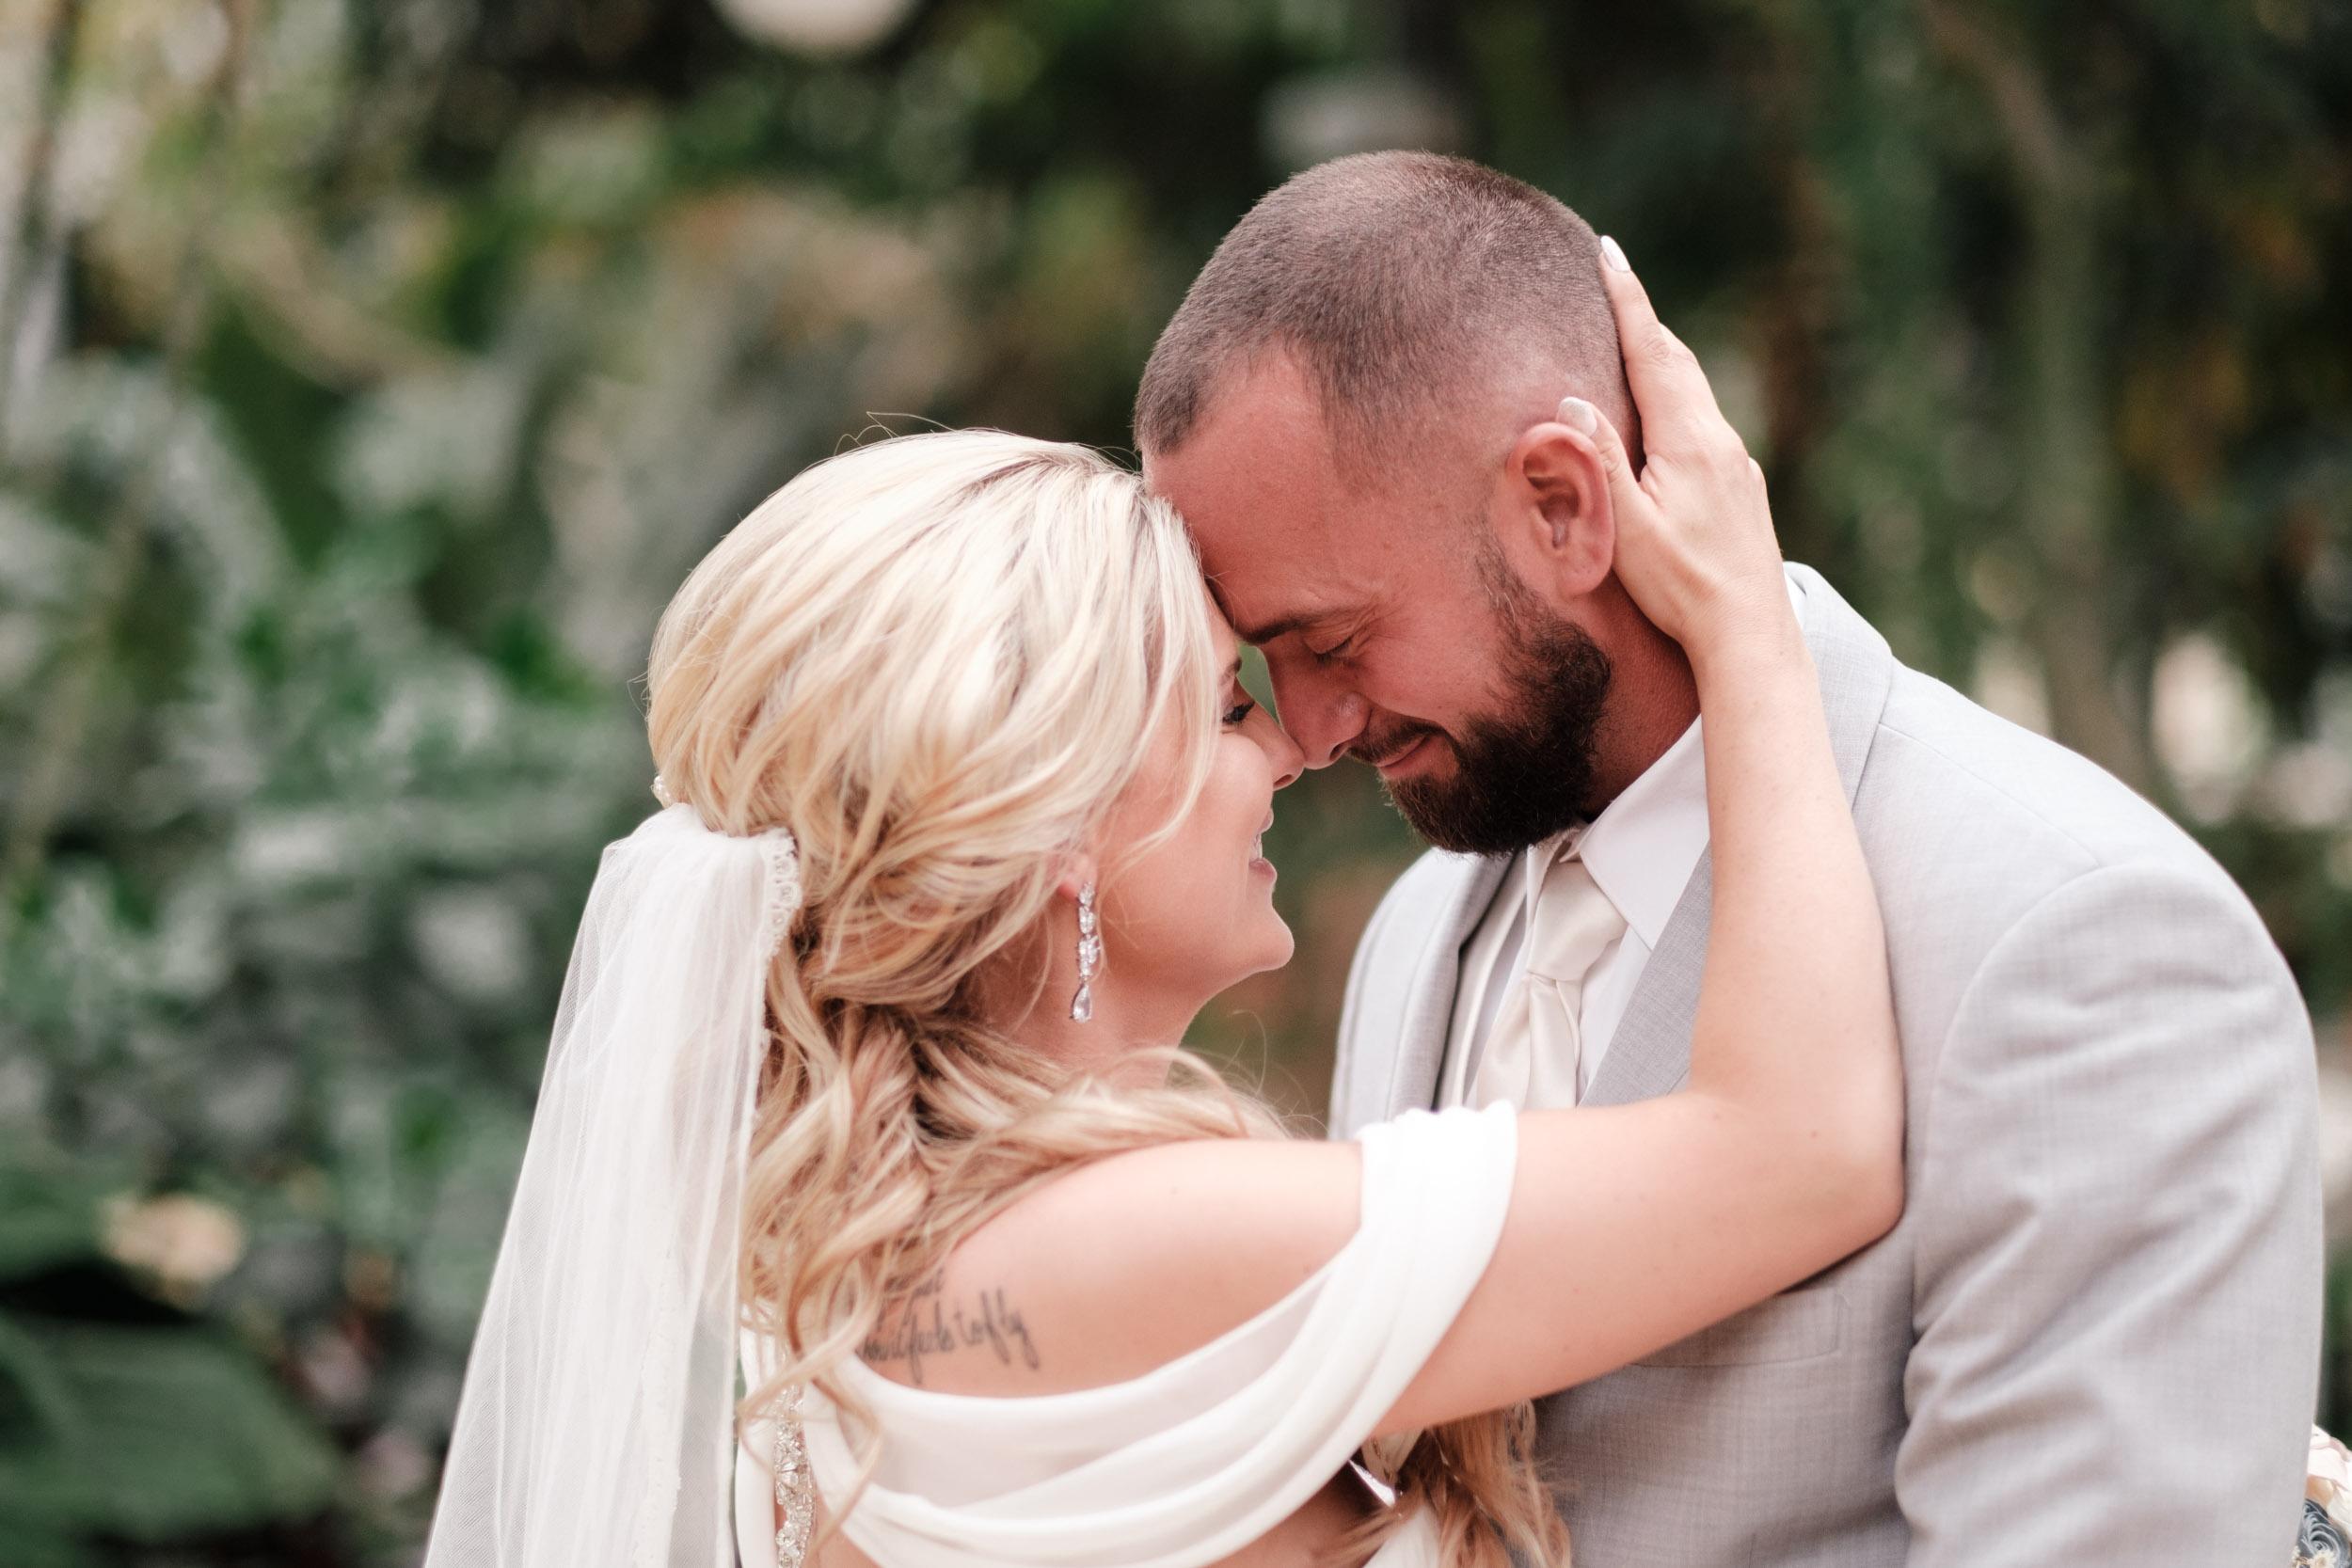 19-06-01 Megan Josh - Nicholas Conservatory Wedding-34.jpg